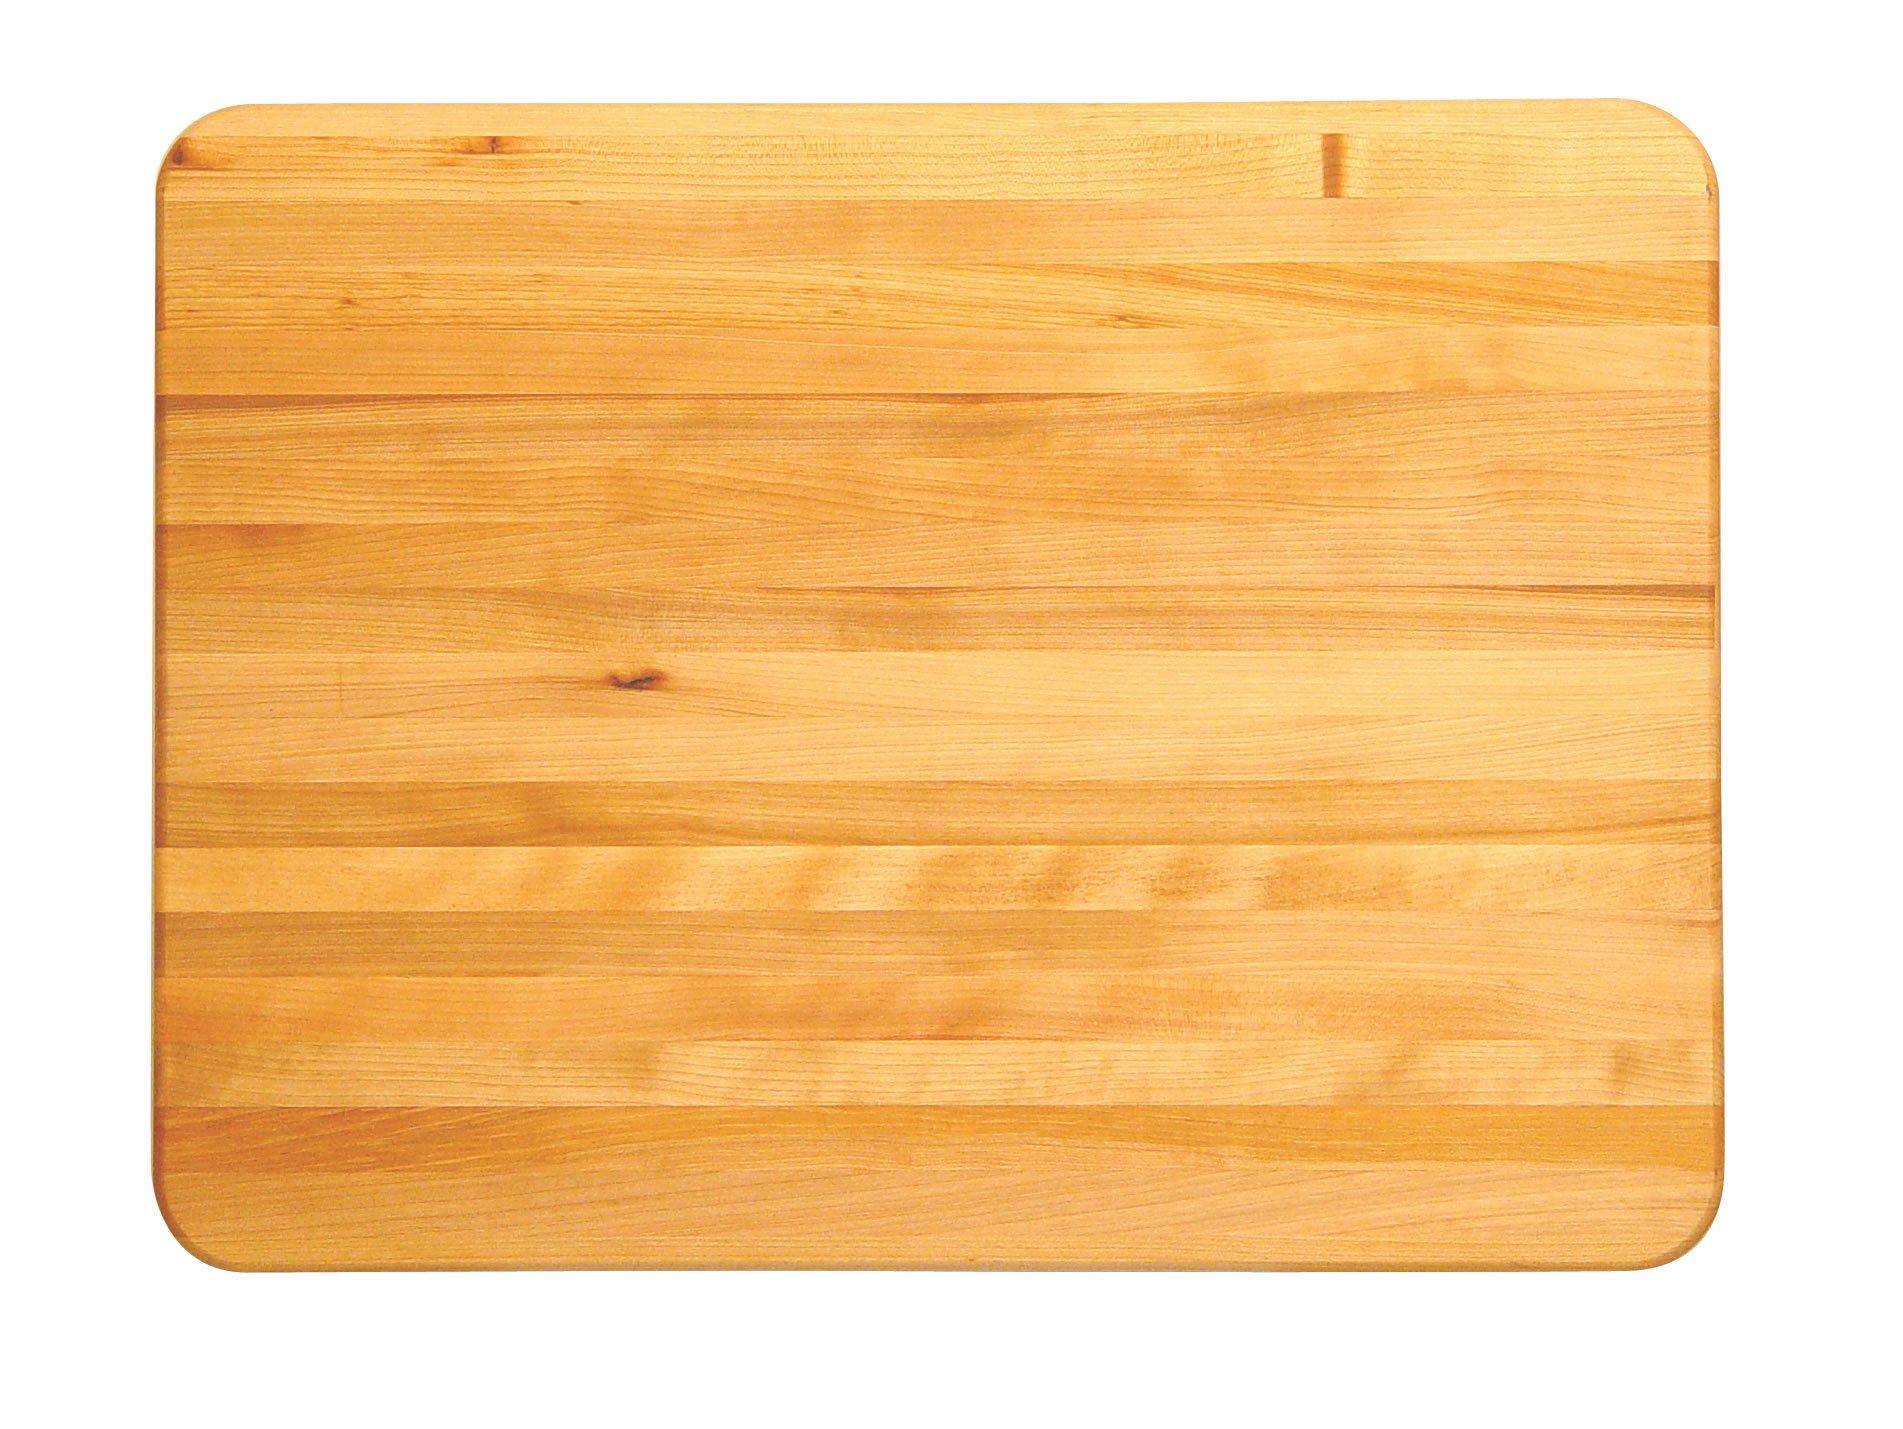 Catskill Craftsmen 23-Inch Pro Series Reversible Cutting Board by Catskill Craftsmen (Image #1)